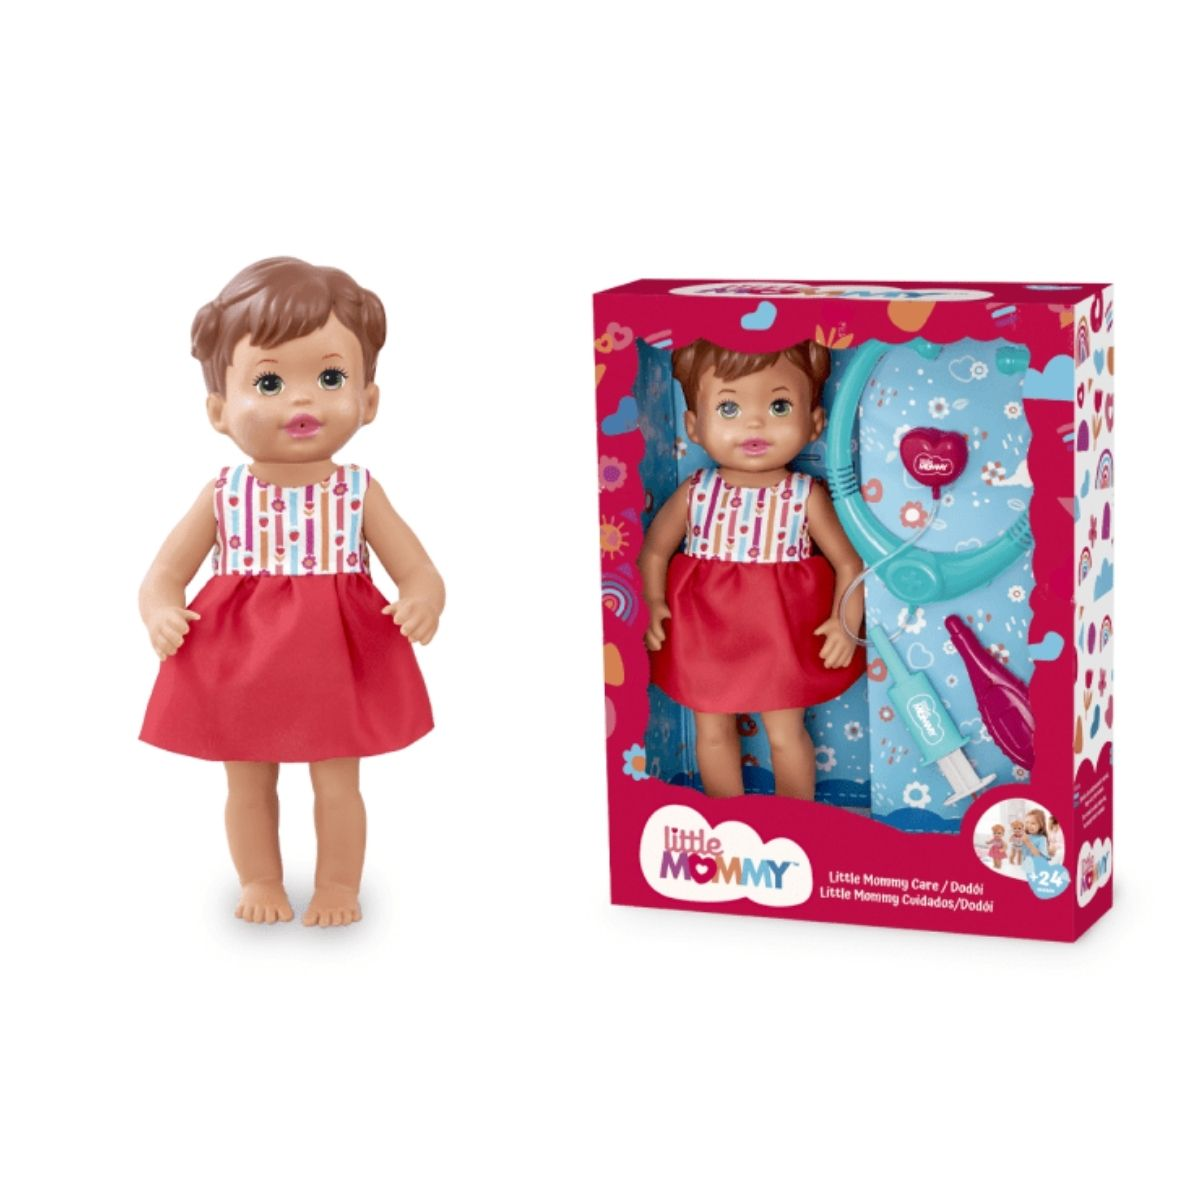 Boneca Little Mommy Dodói Morena Com Acessorios 1033 Pupee